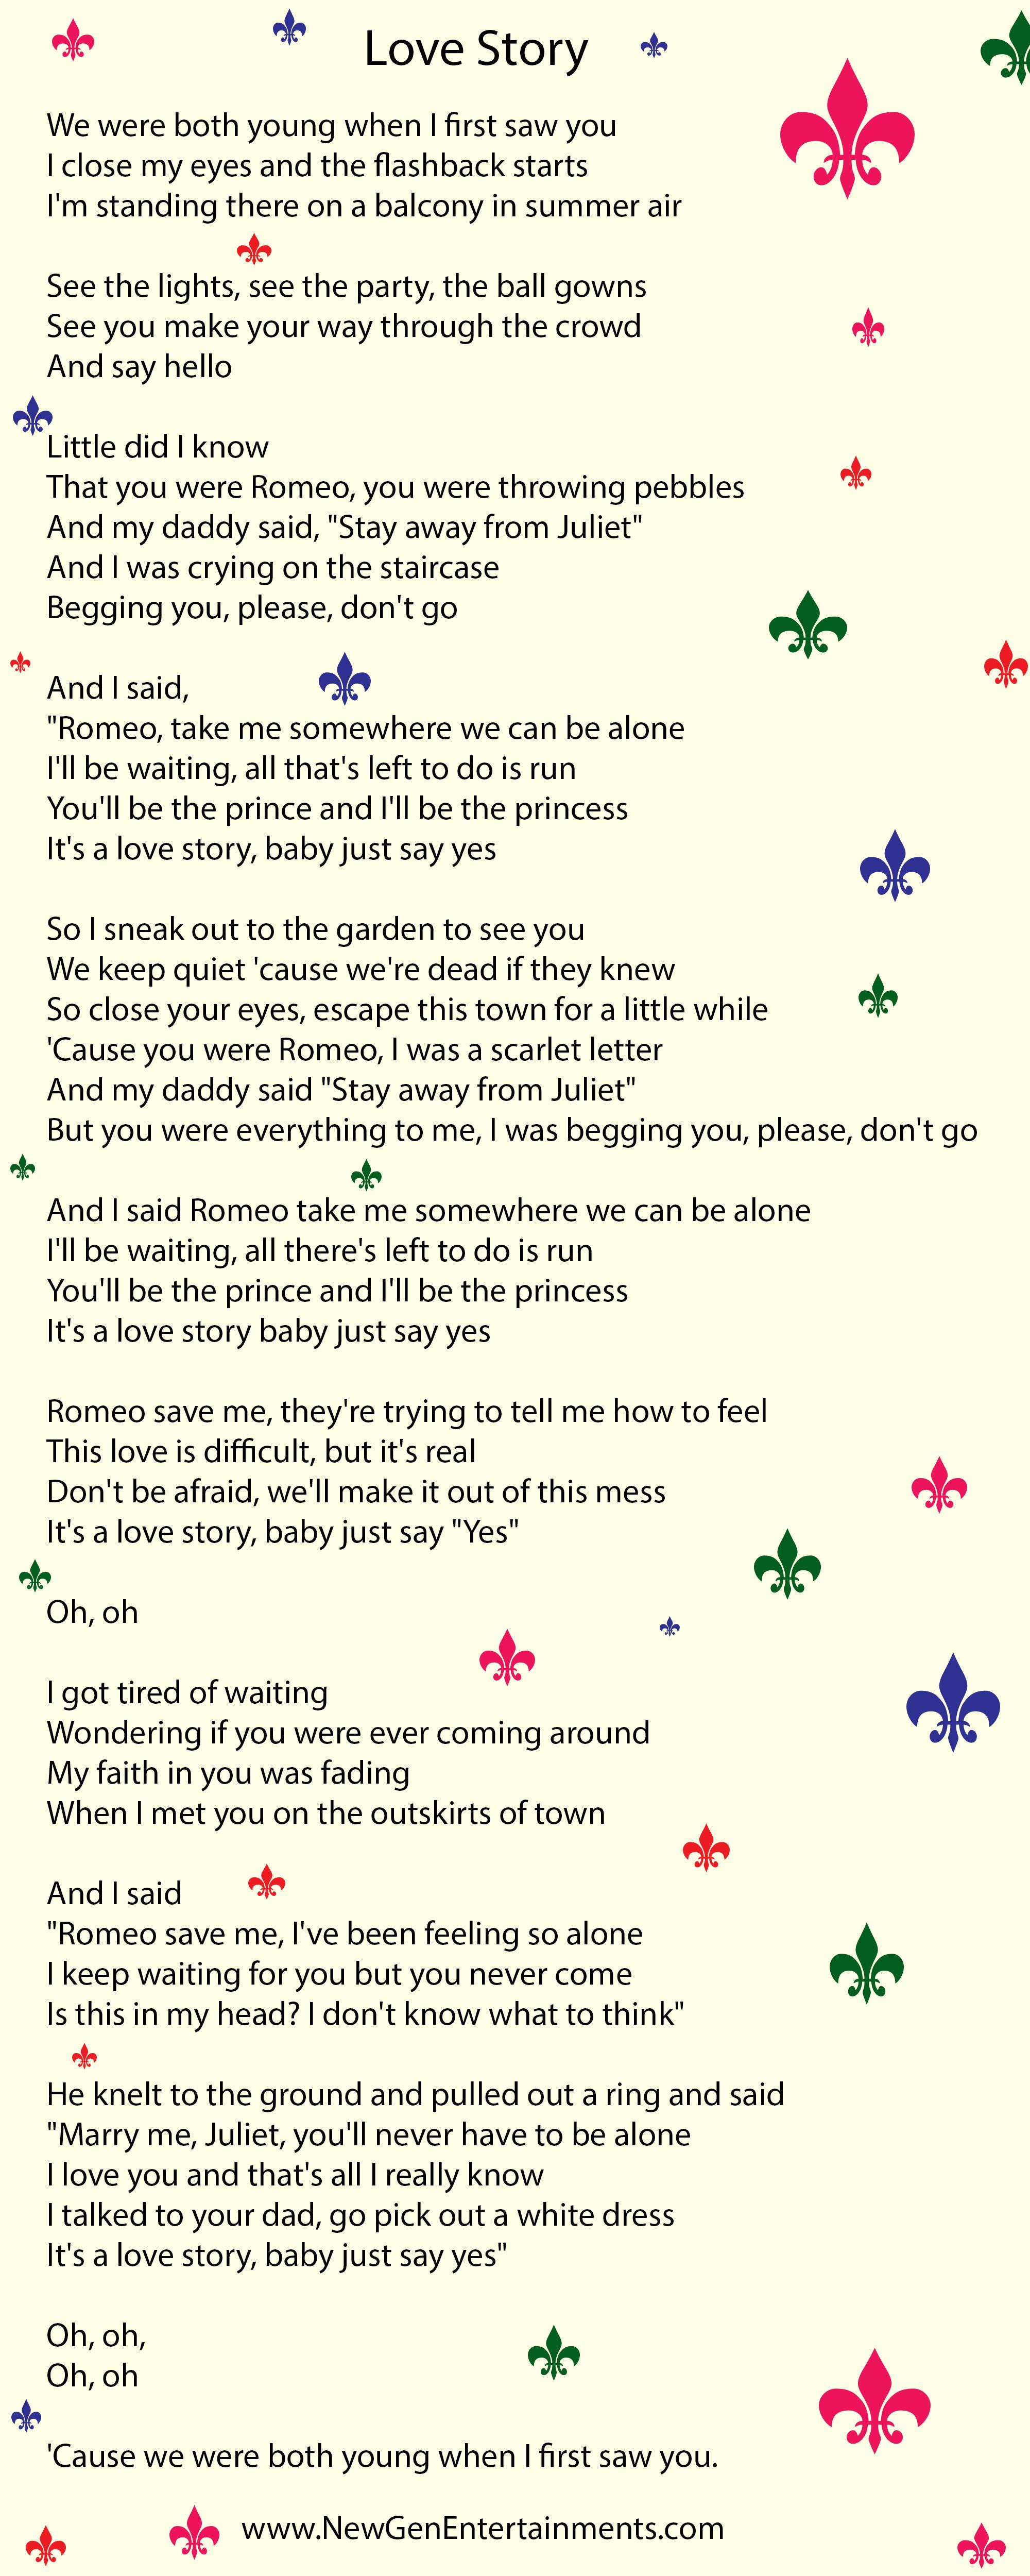 Love Story Lyrics Taylor Swift New Gen Entertainments